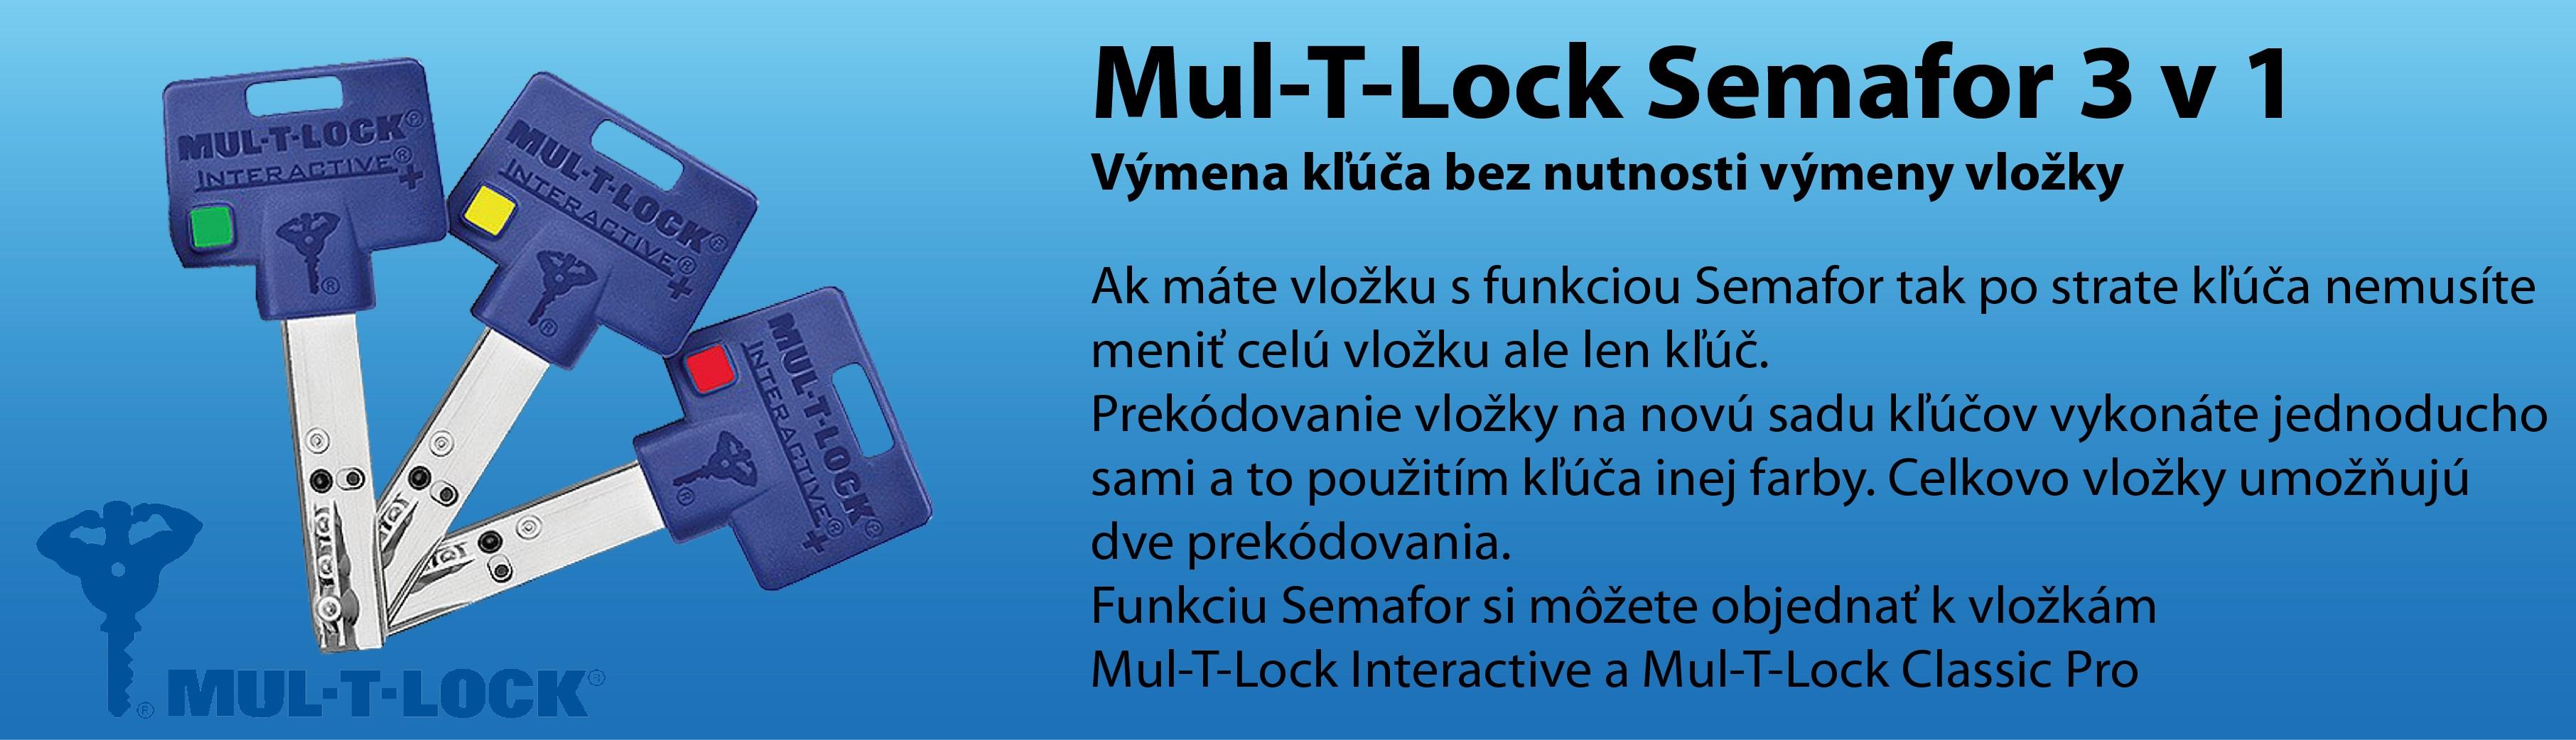 Mul-T-Lock Semafor 3 v 1